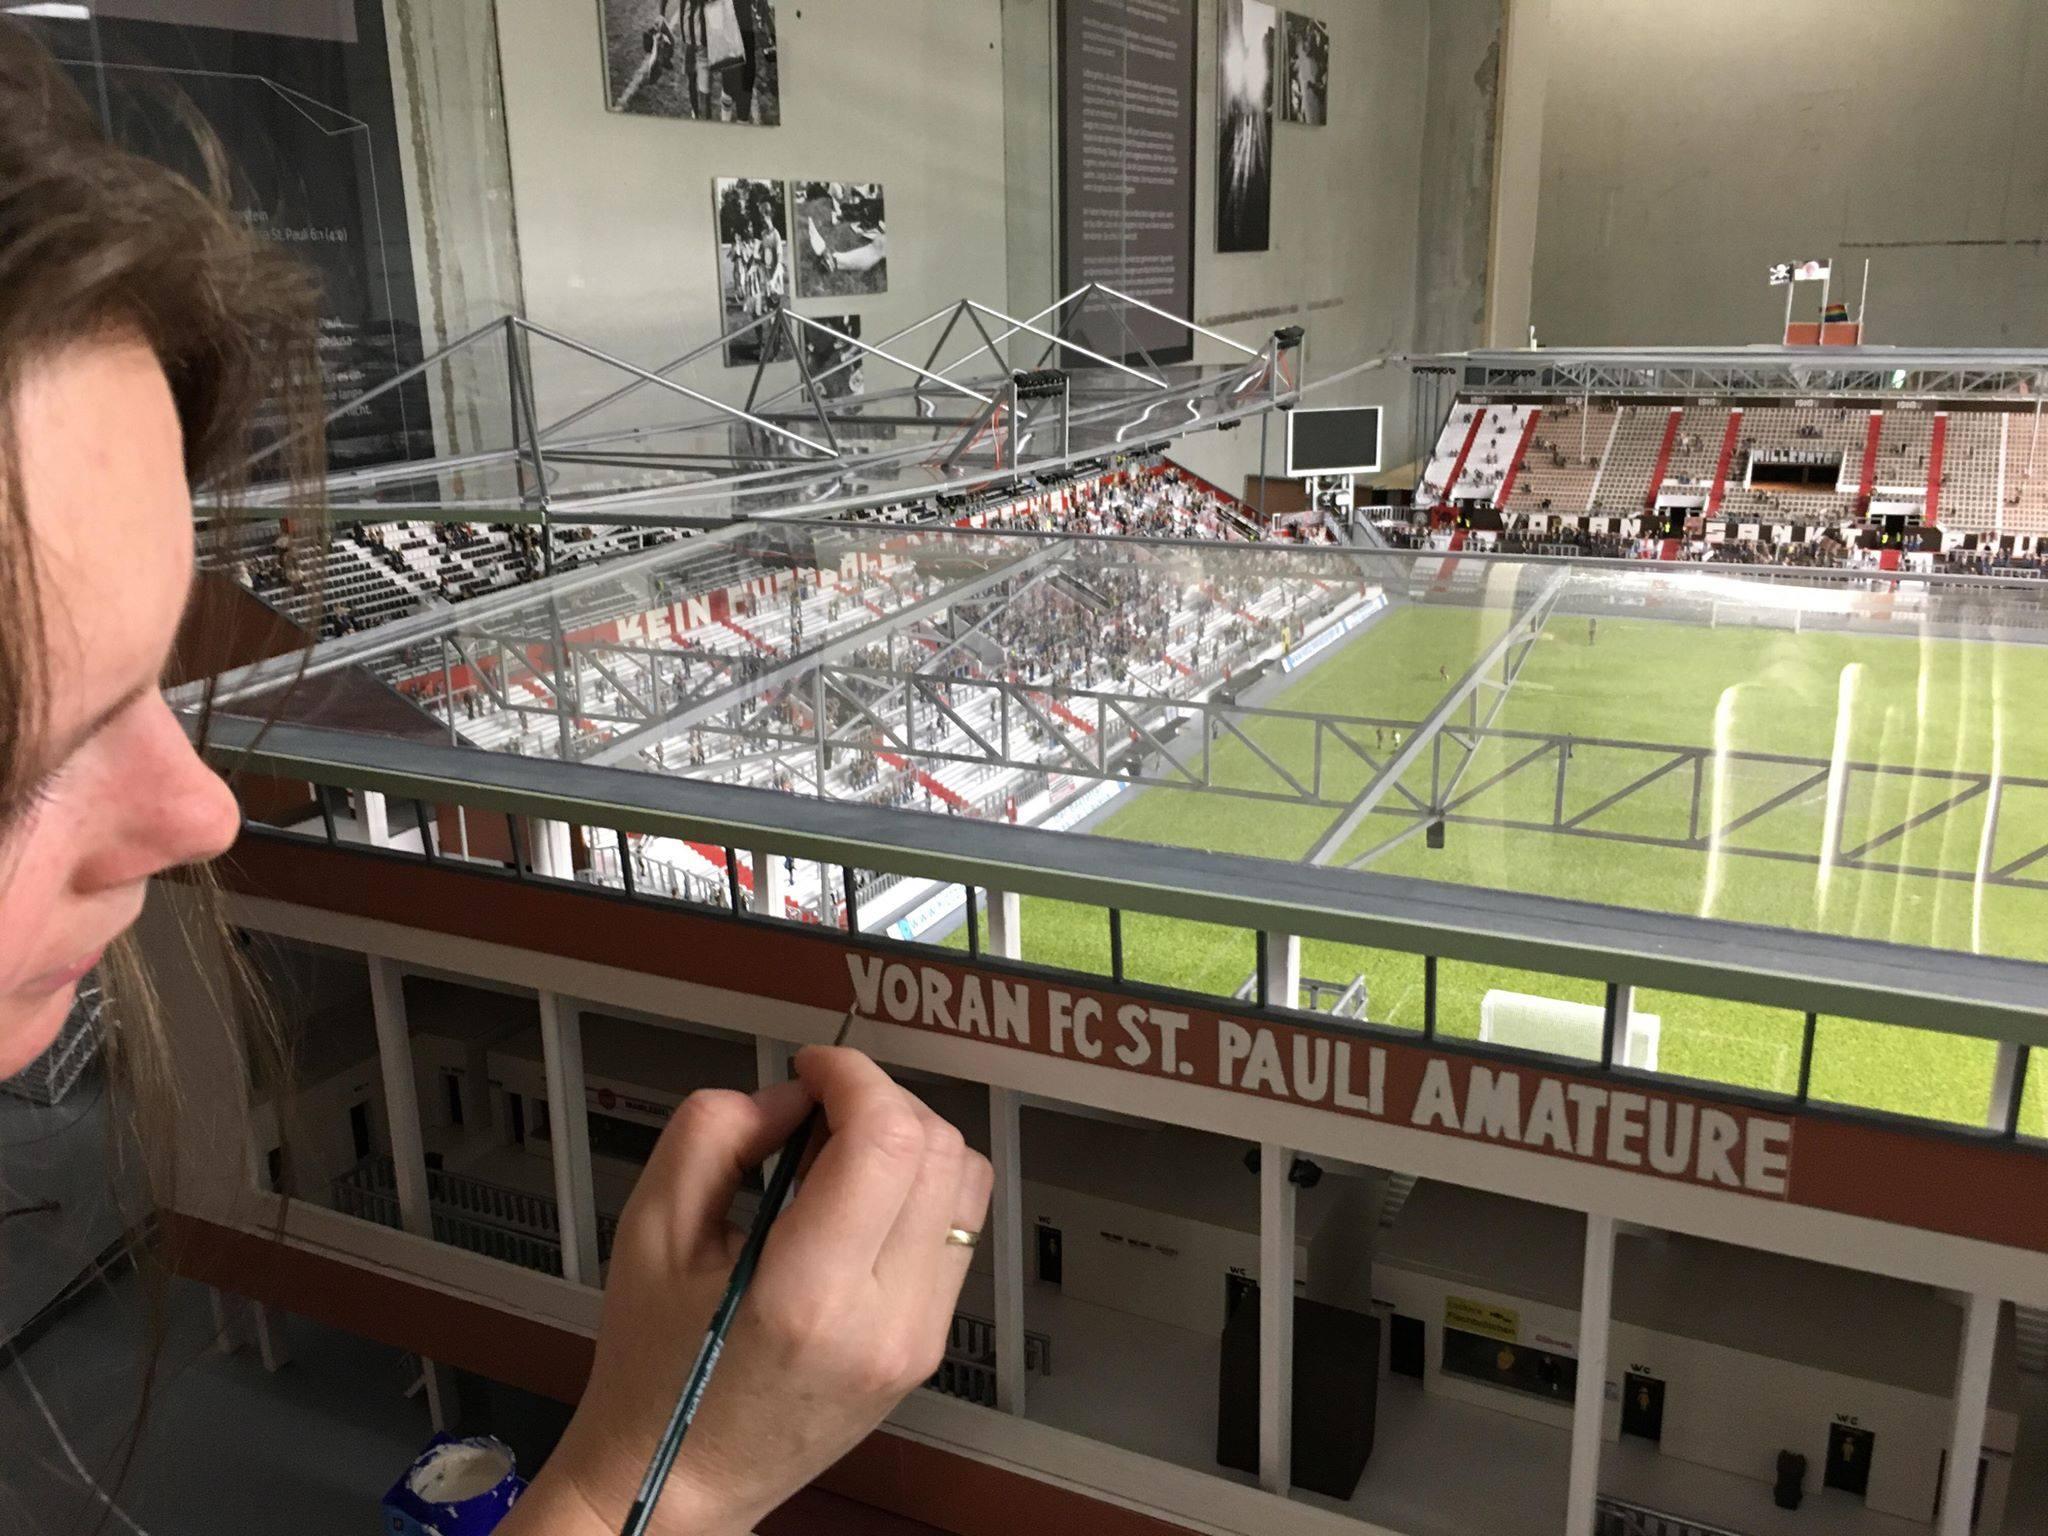 Stadionmodell: Millerntor hoch 1910!